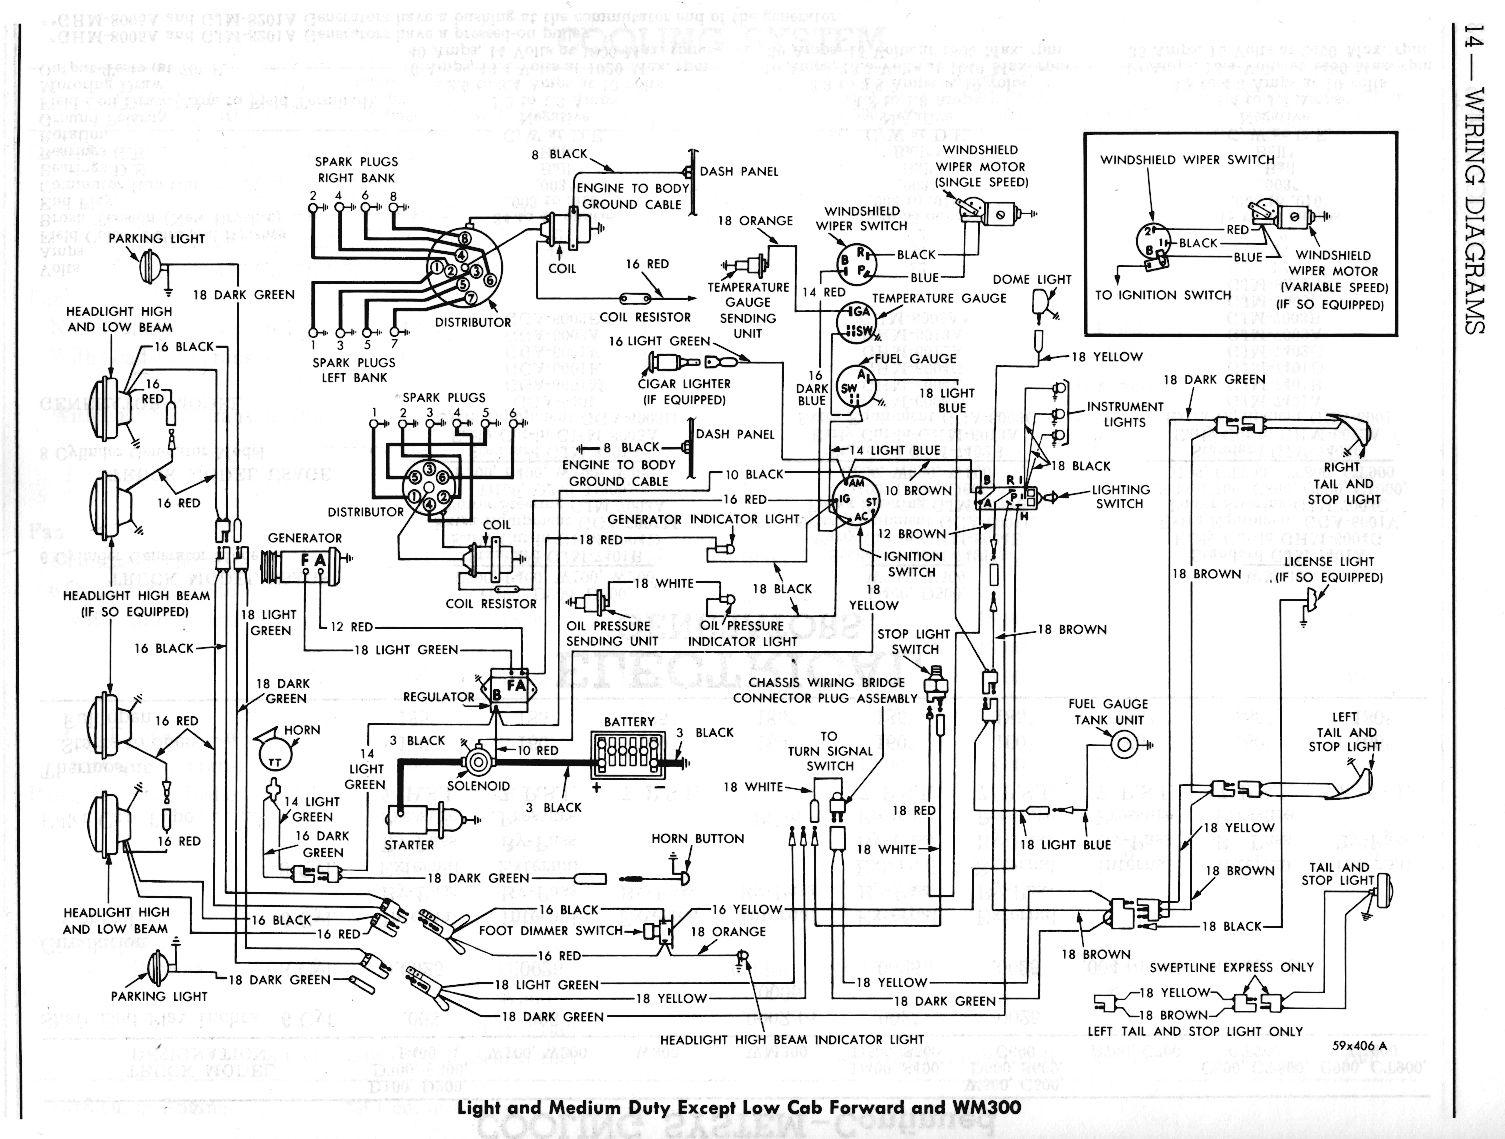 honda xr 650 r wire diagram  honda  auto wiring diagram